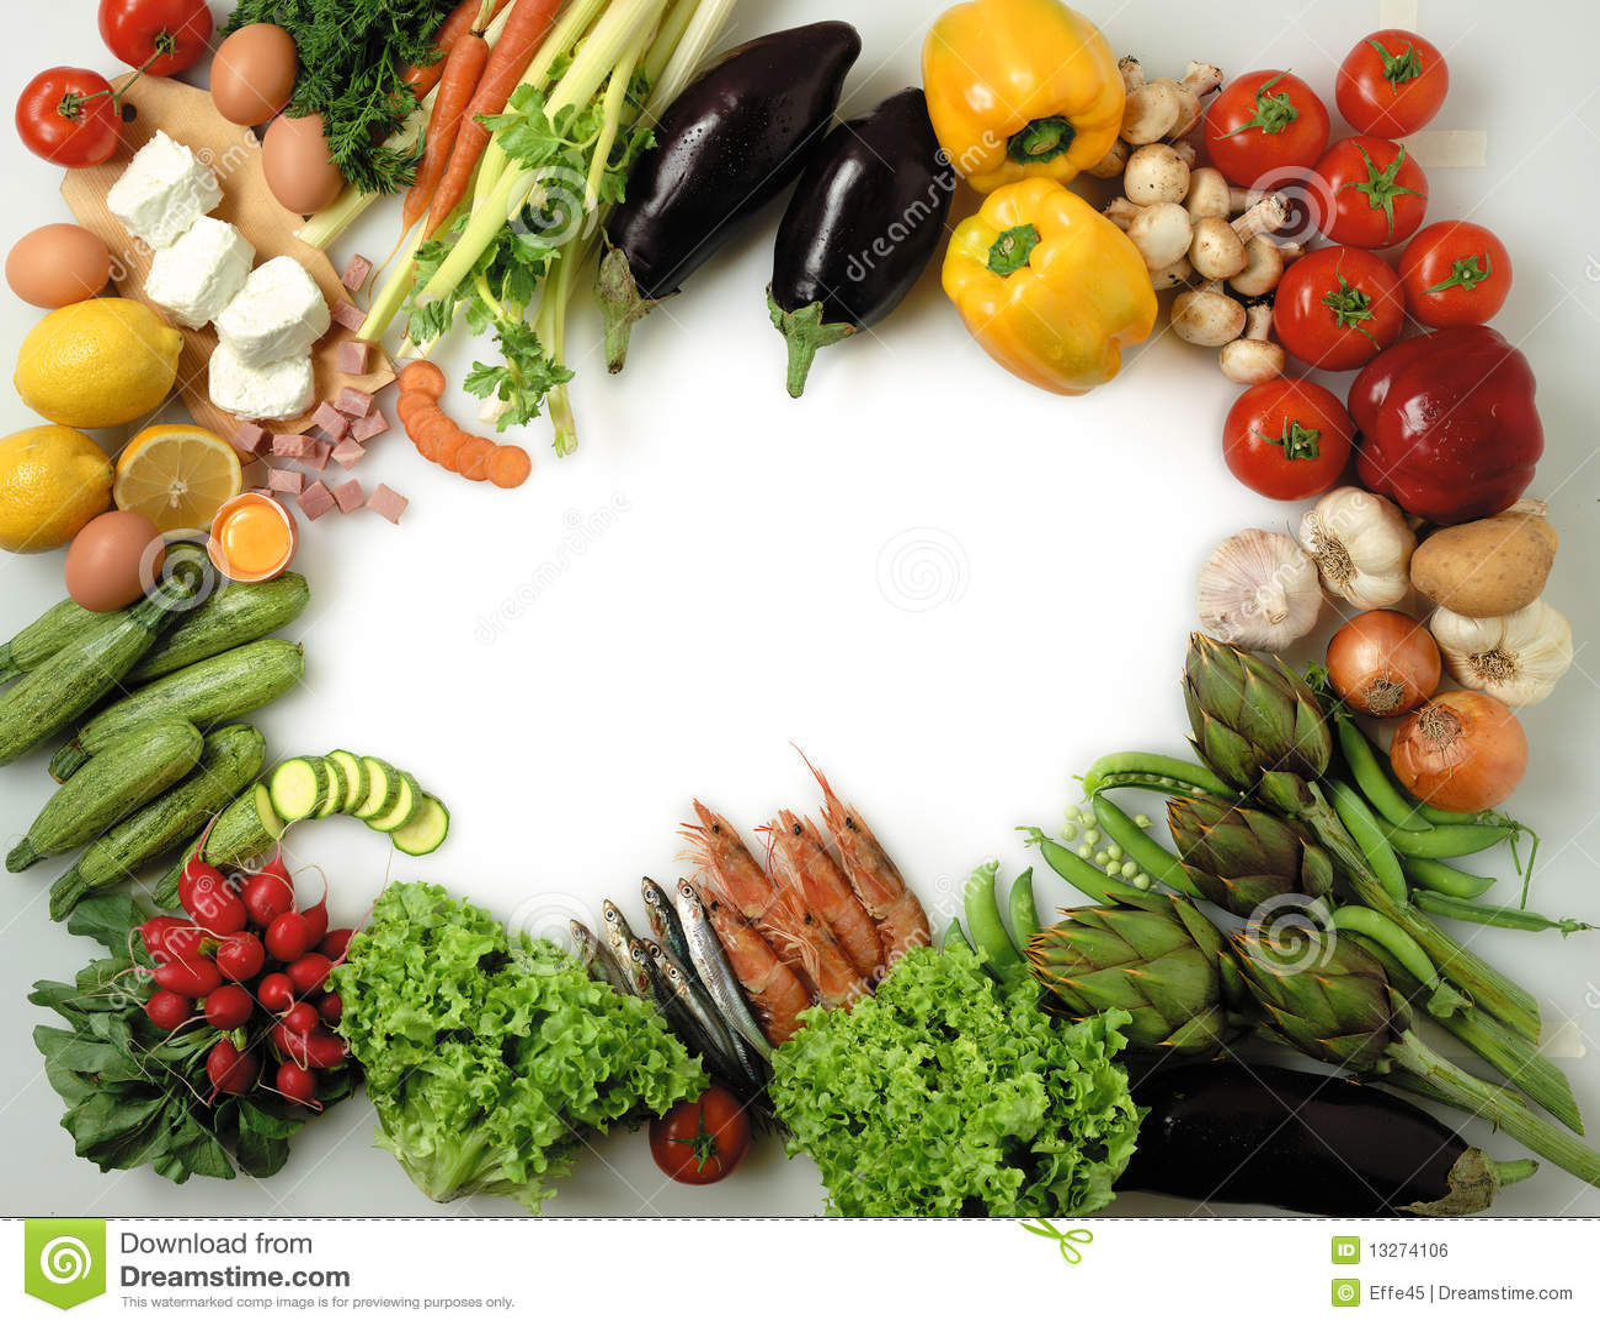 Food Frame Royalty Free Stock Image - Image: 13274106